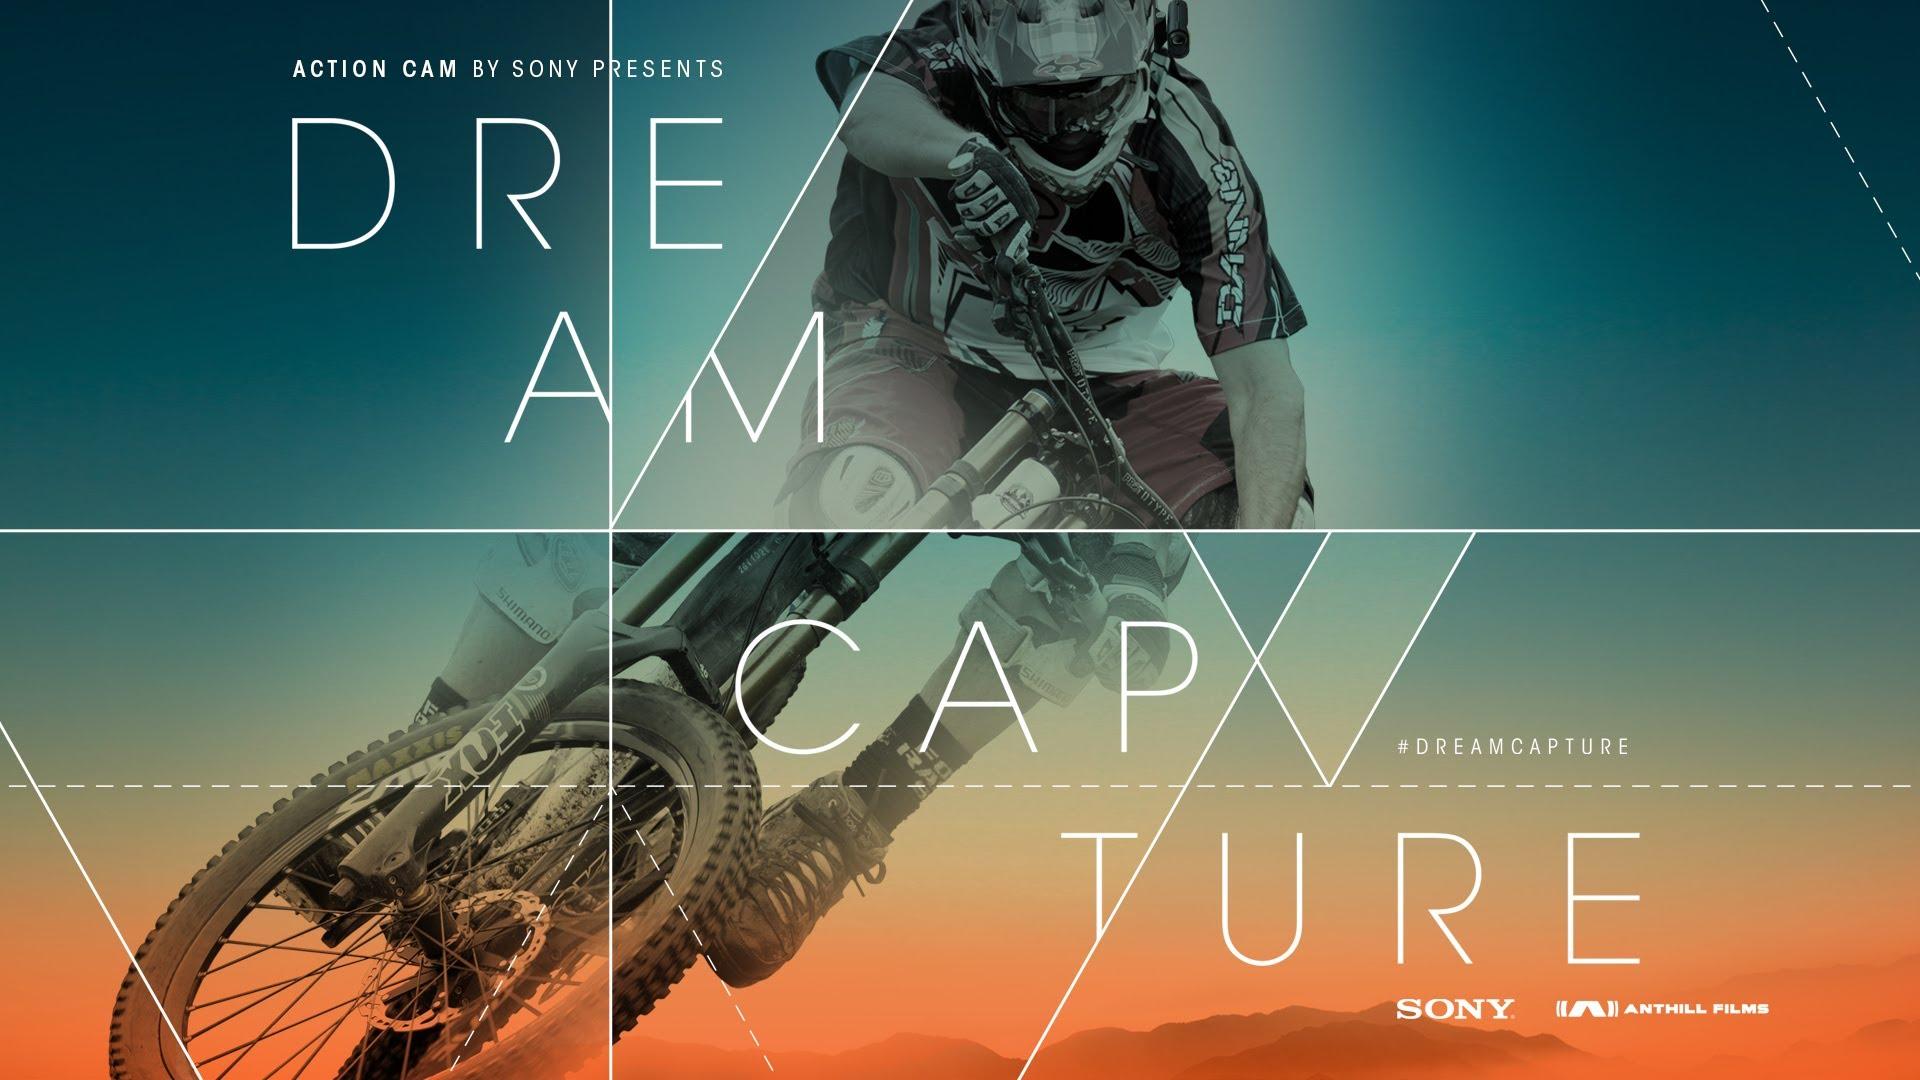 sony actioncam dream capture